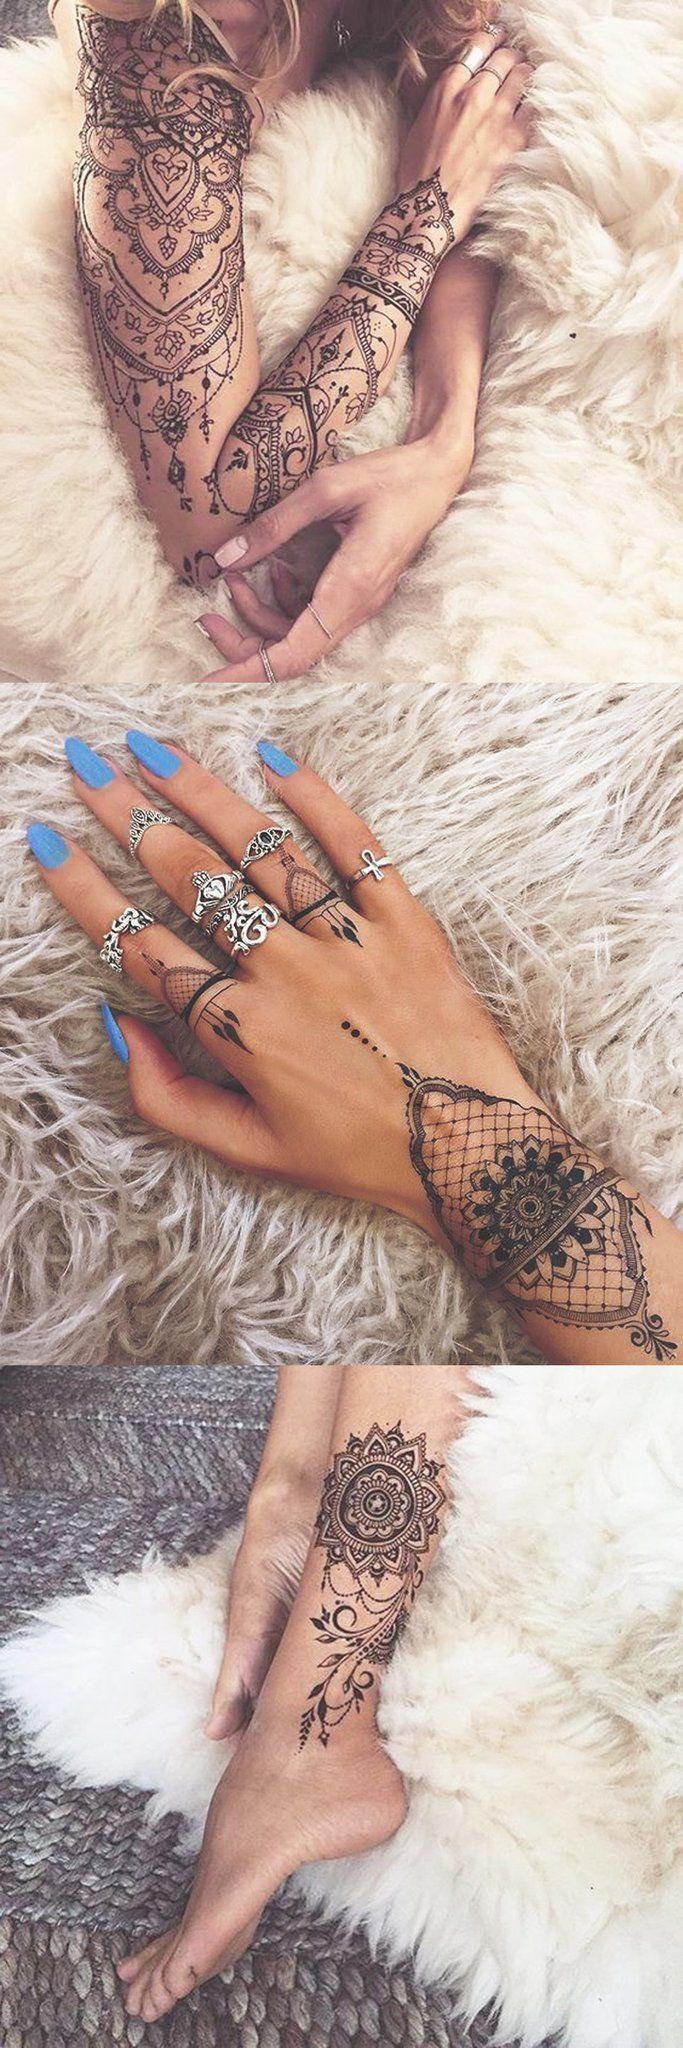 , Sacred Geometric Mandala Tattoo Ideas for Women – Lace Black Henna Lotus Tatt – Full Arm Sleeve Tat – Chandelier Tatouage – MyBodiArt.com, My Tattoo Blog 2020, My Tattoo Blog 2020